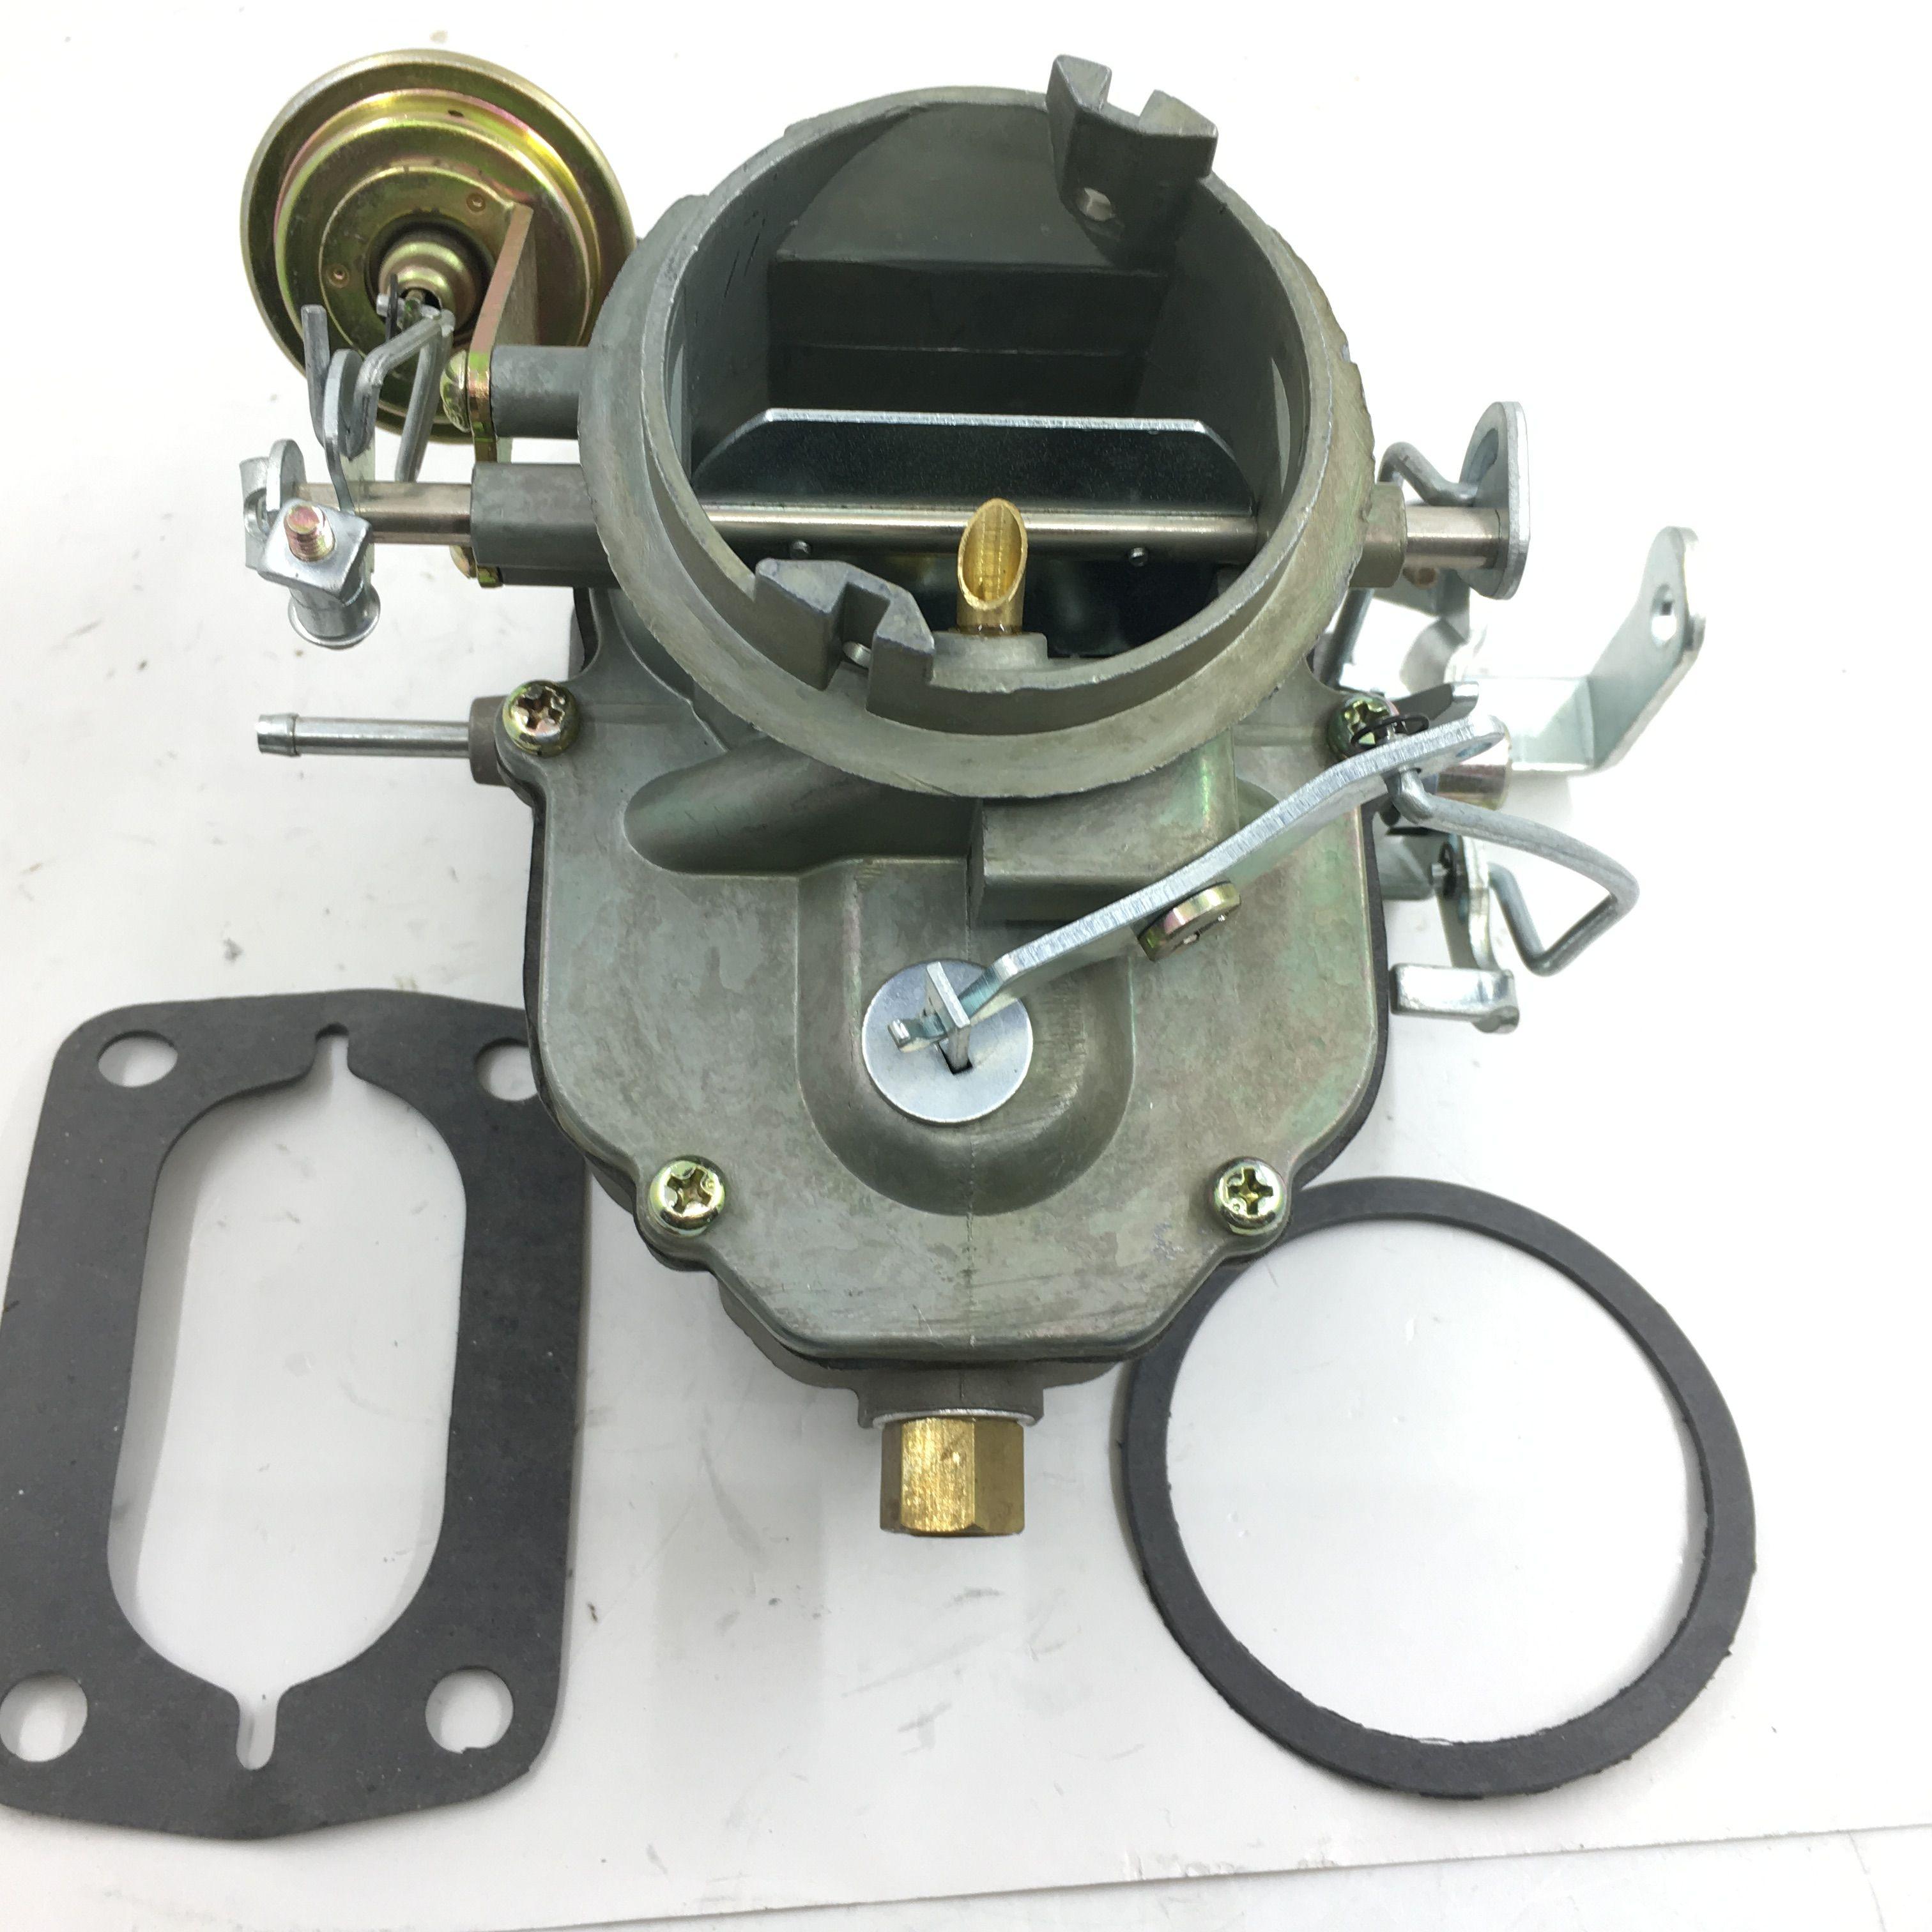 Carburador Carburador Carby para Chrysler 318 para Carter Bbd Dodge 318 barril 2 1966